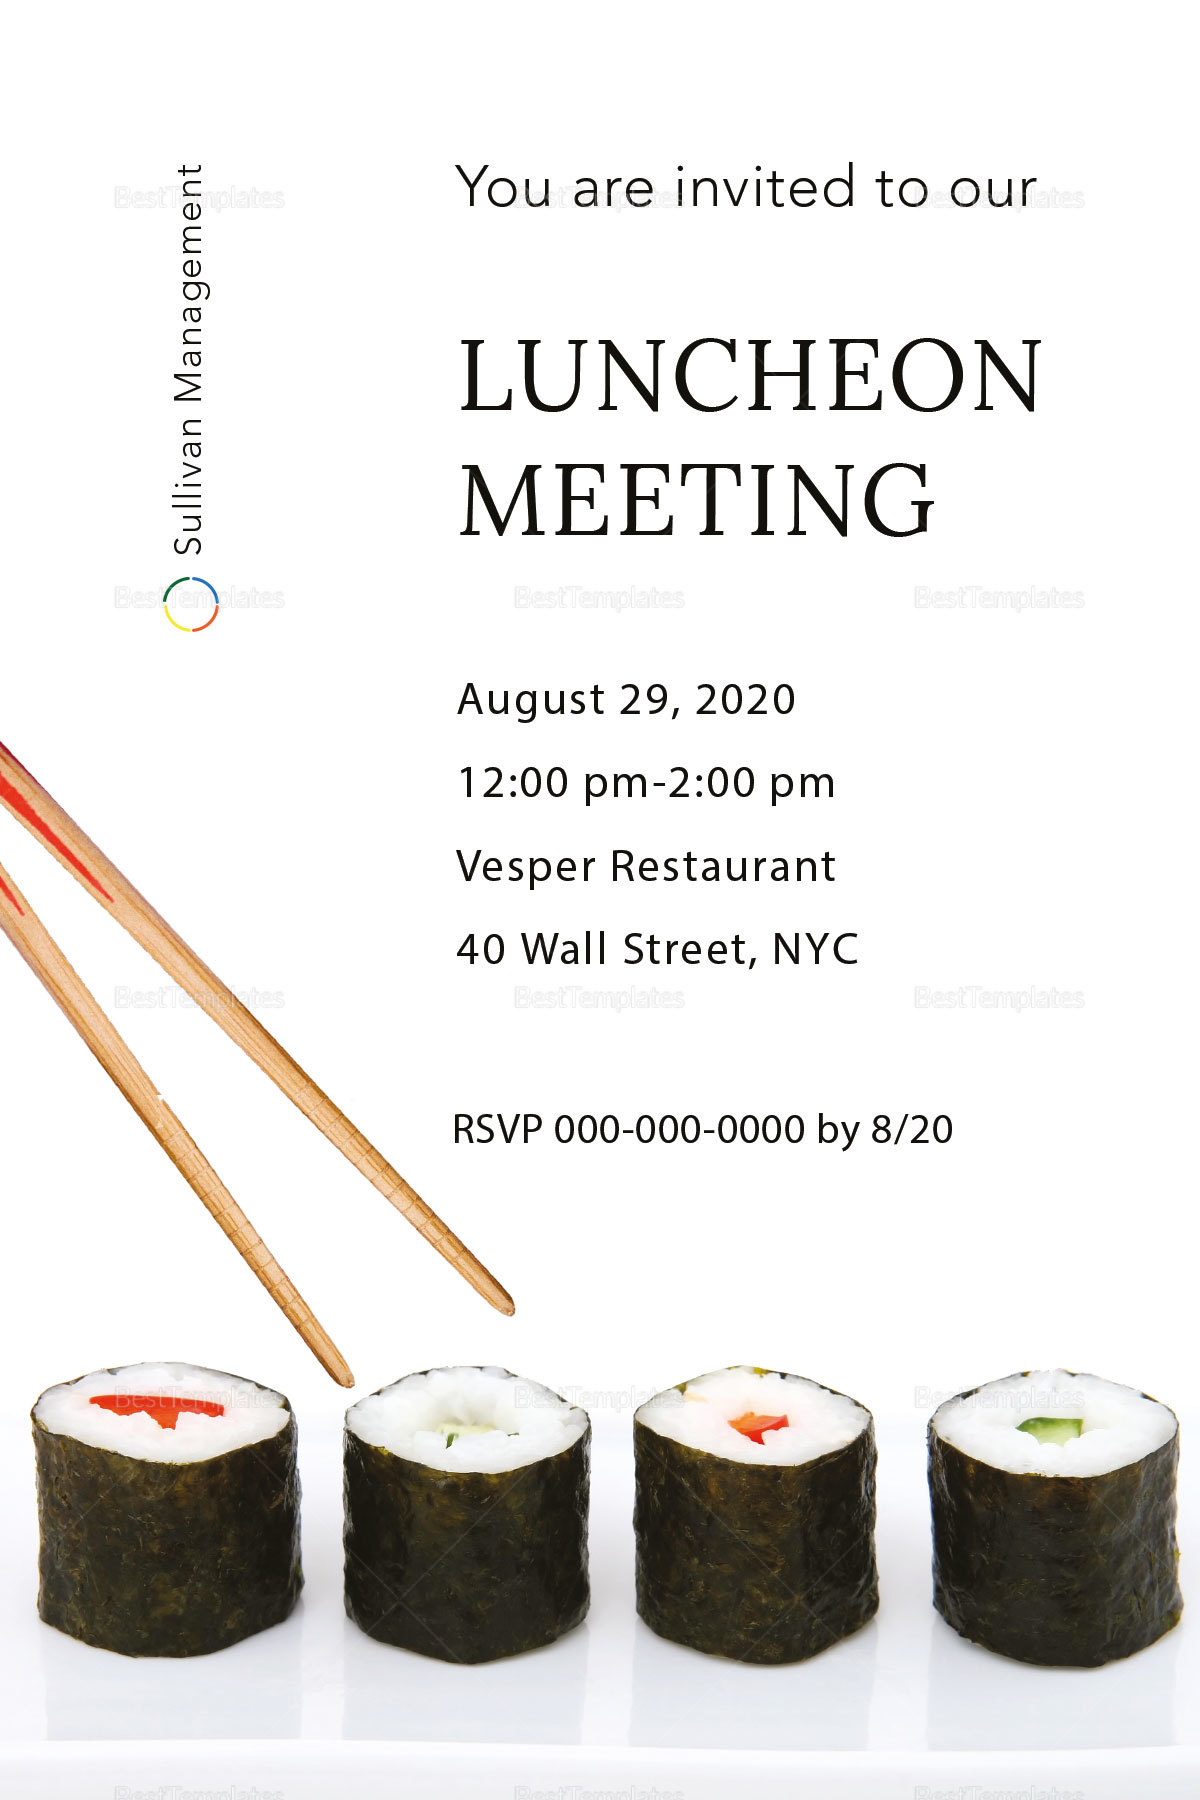 Luncheon Meeting Invitation